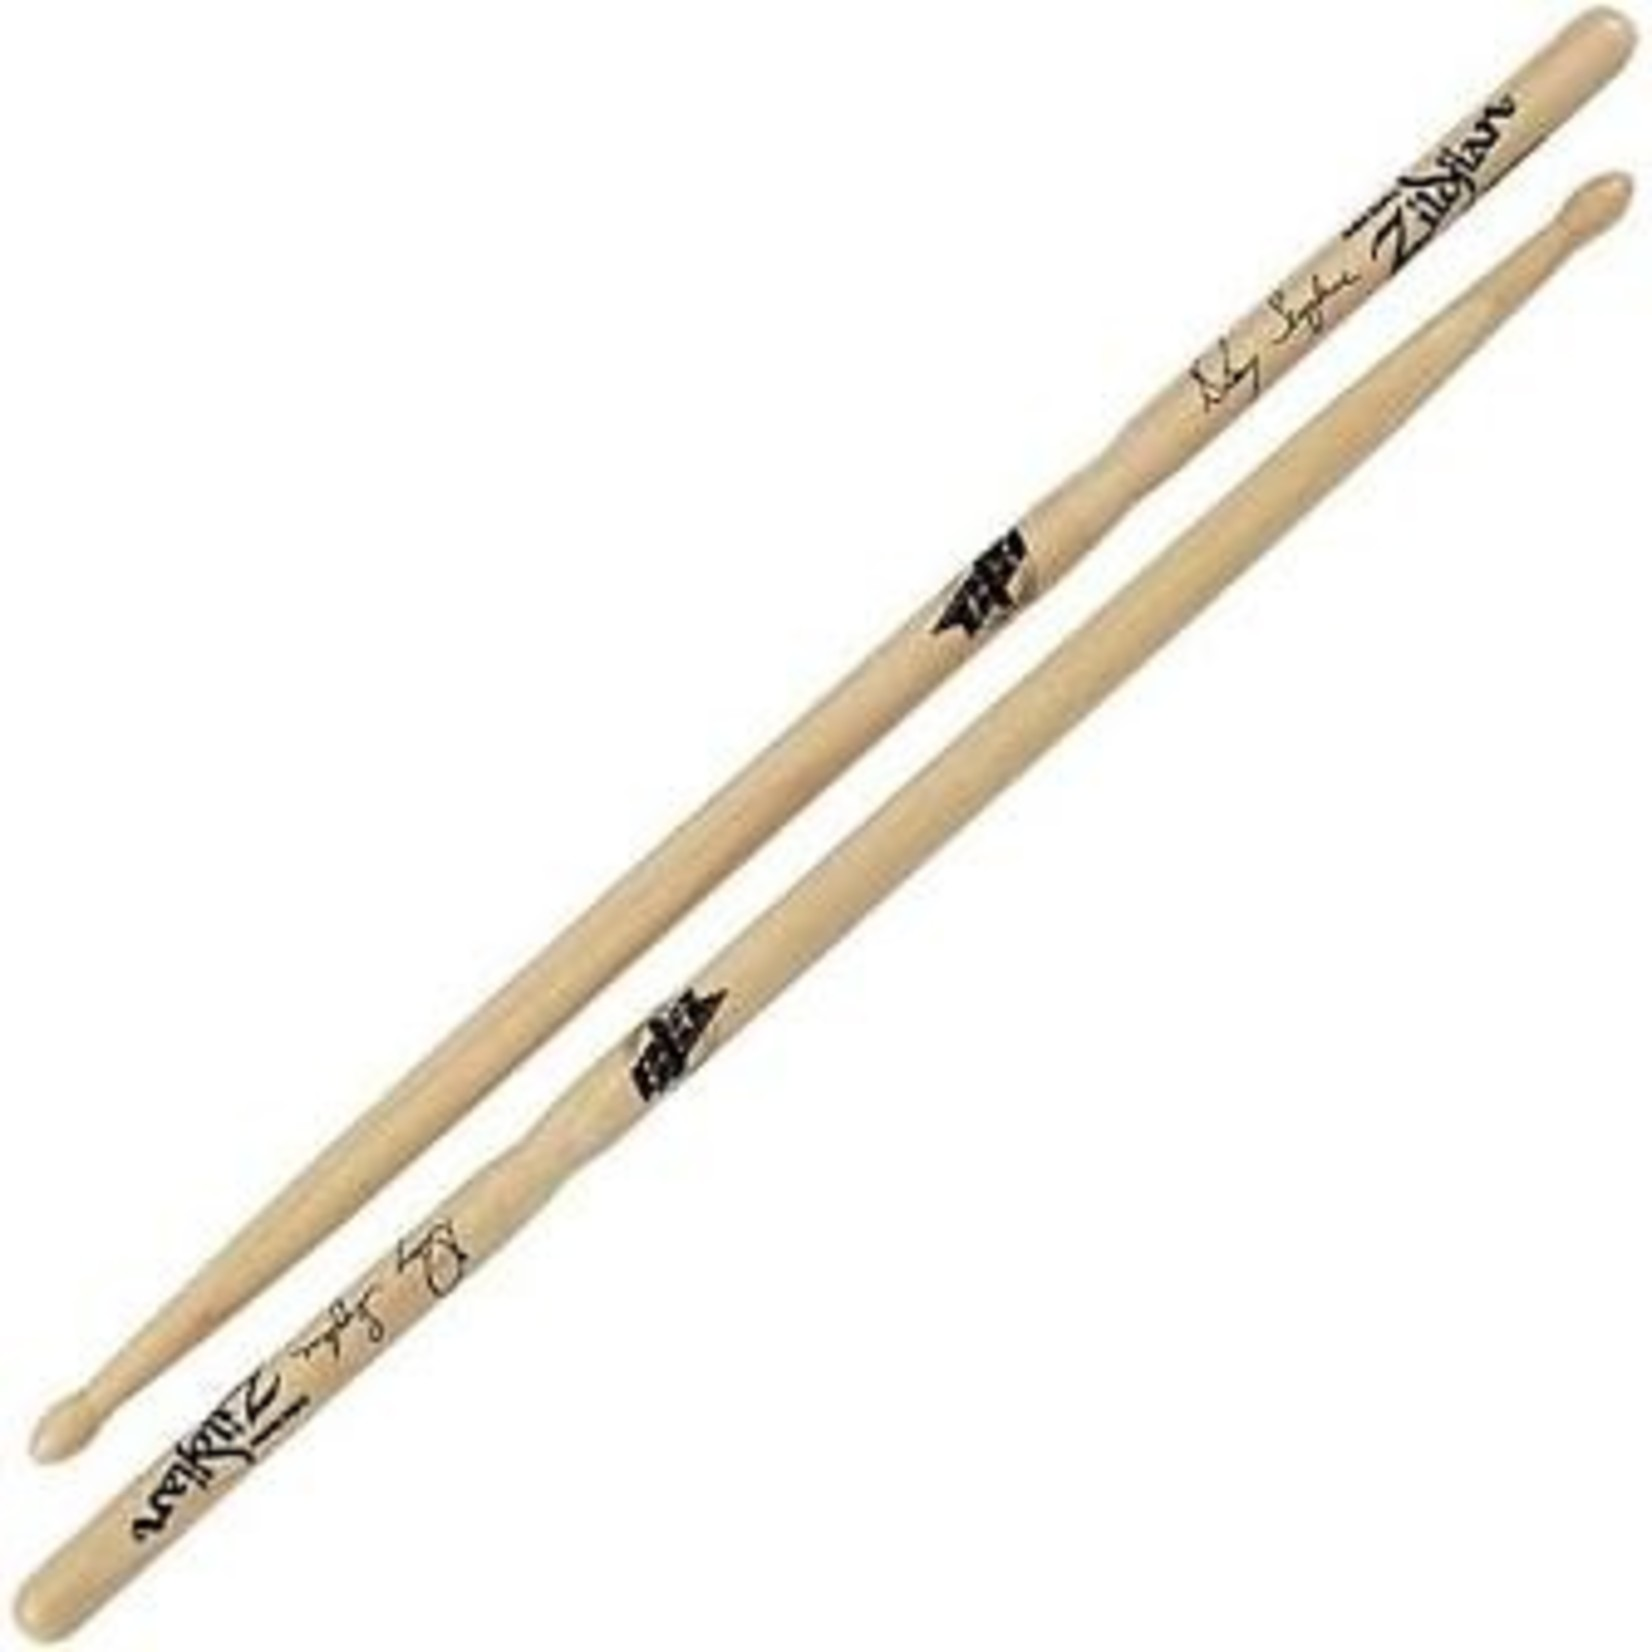 Zildjian Zildjian Danny Seraphine Artist Series Drumsticks